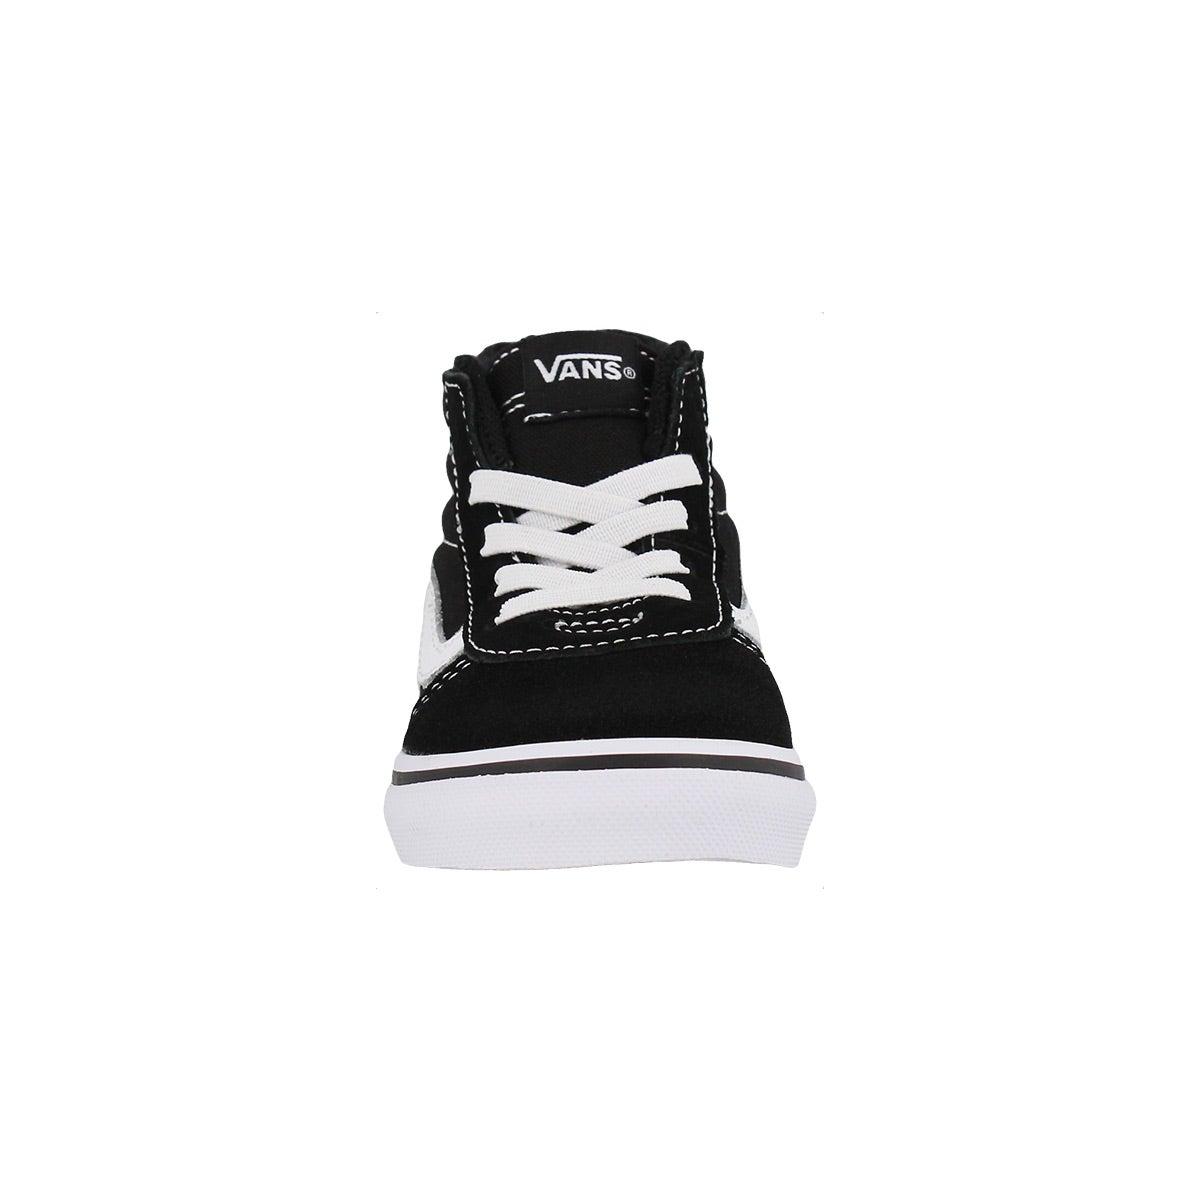 Infs Ward Hi Zip blk/wht cnvs sneaker